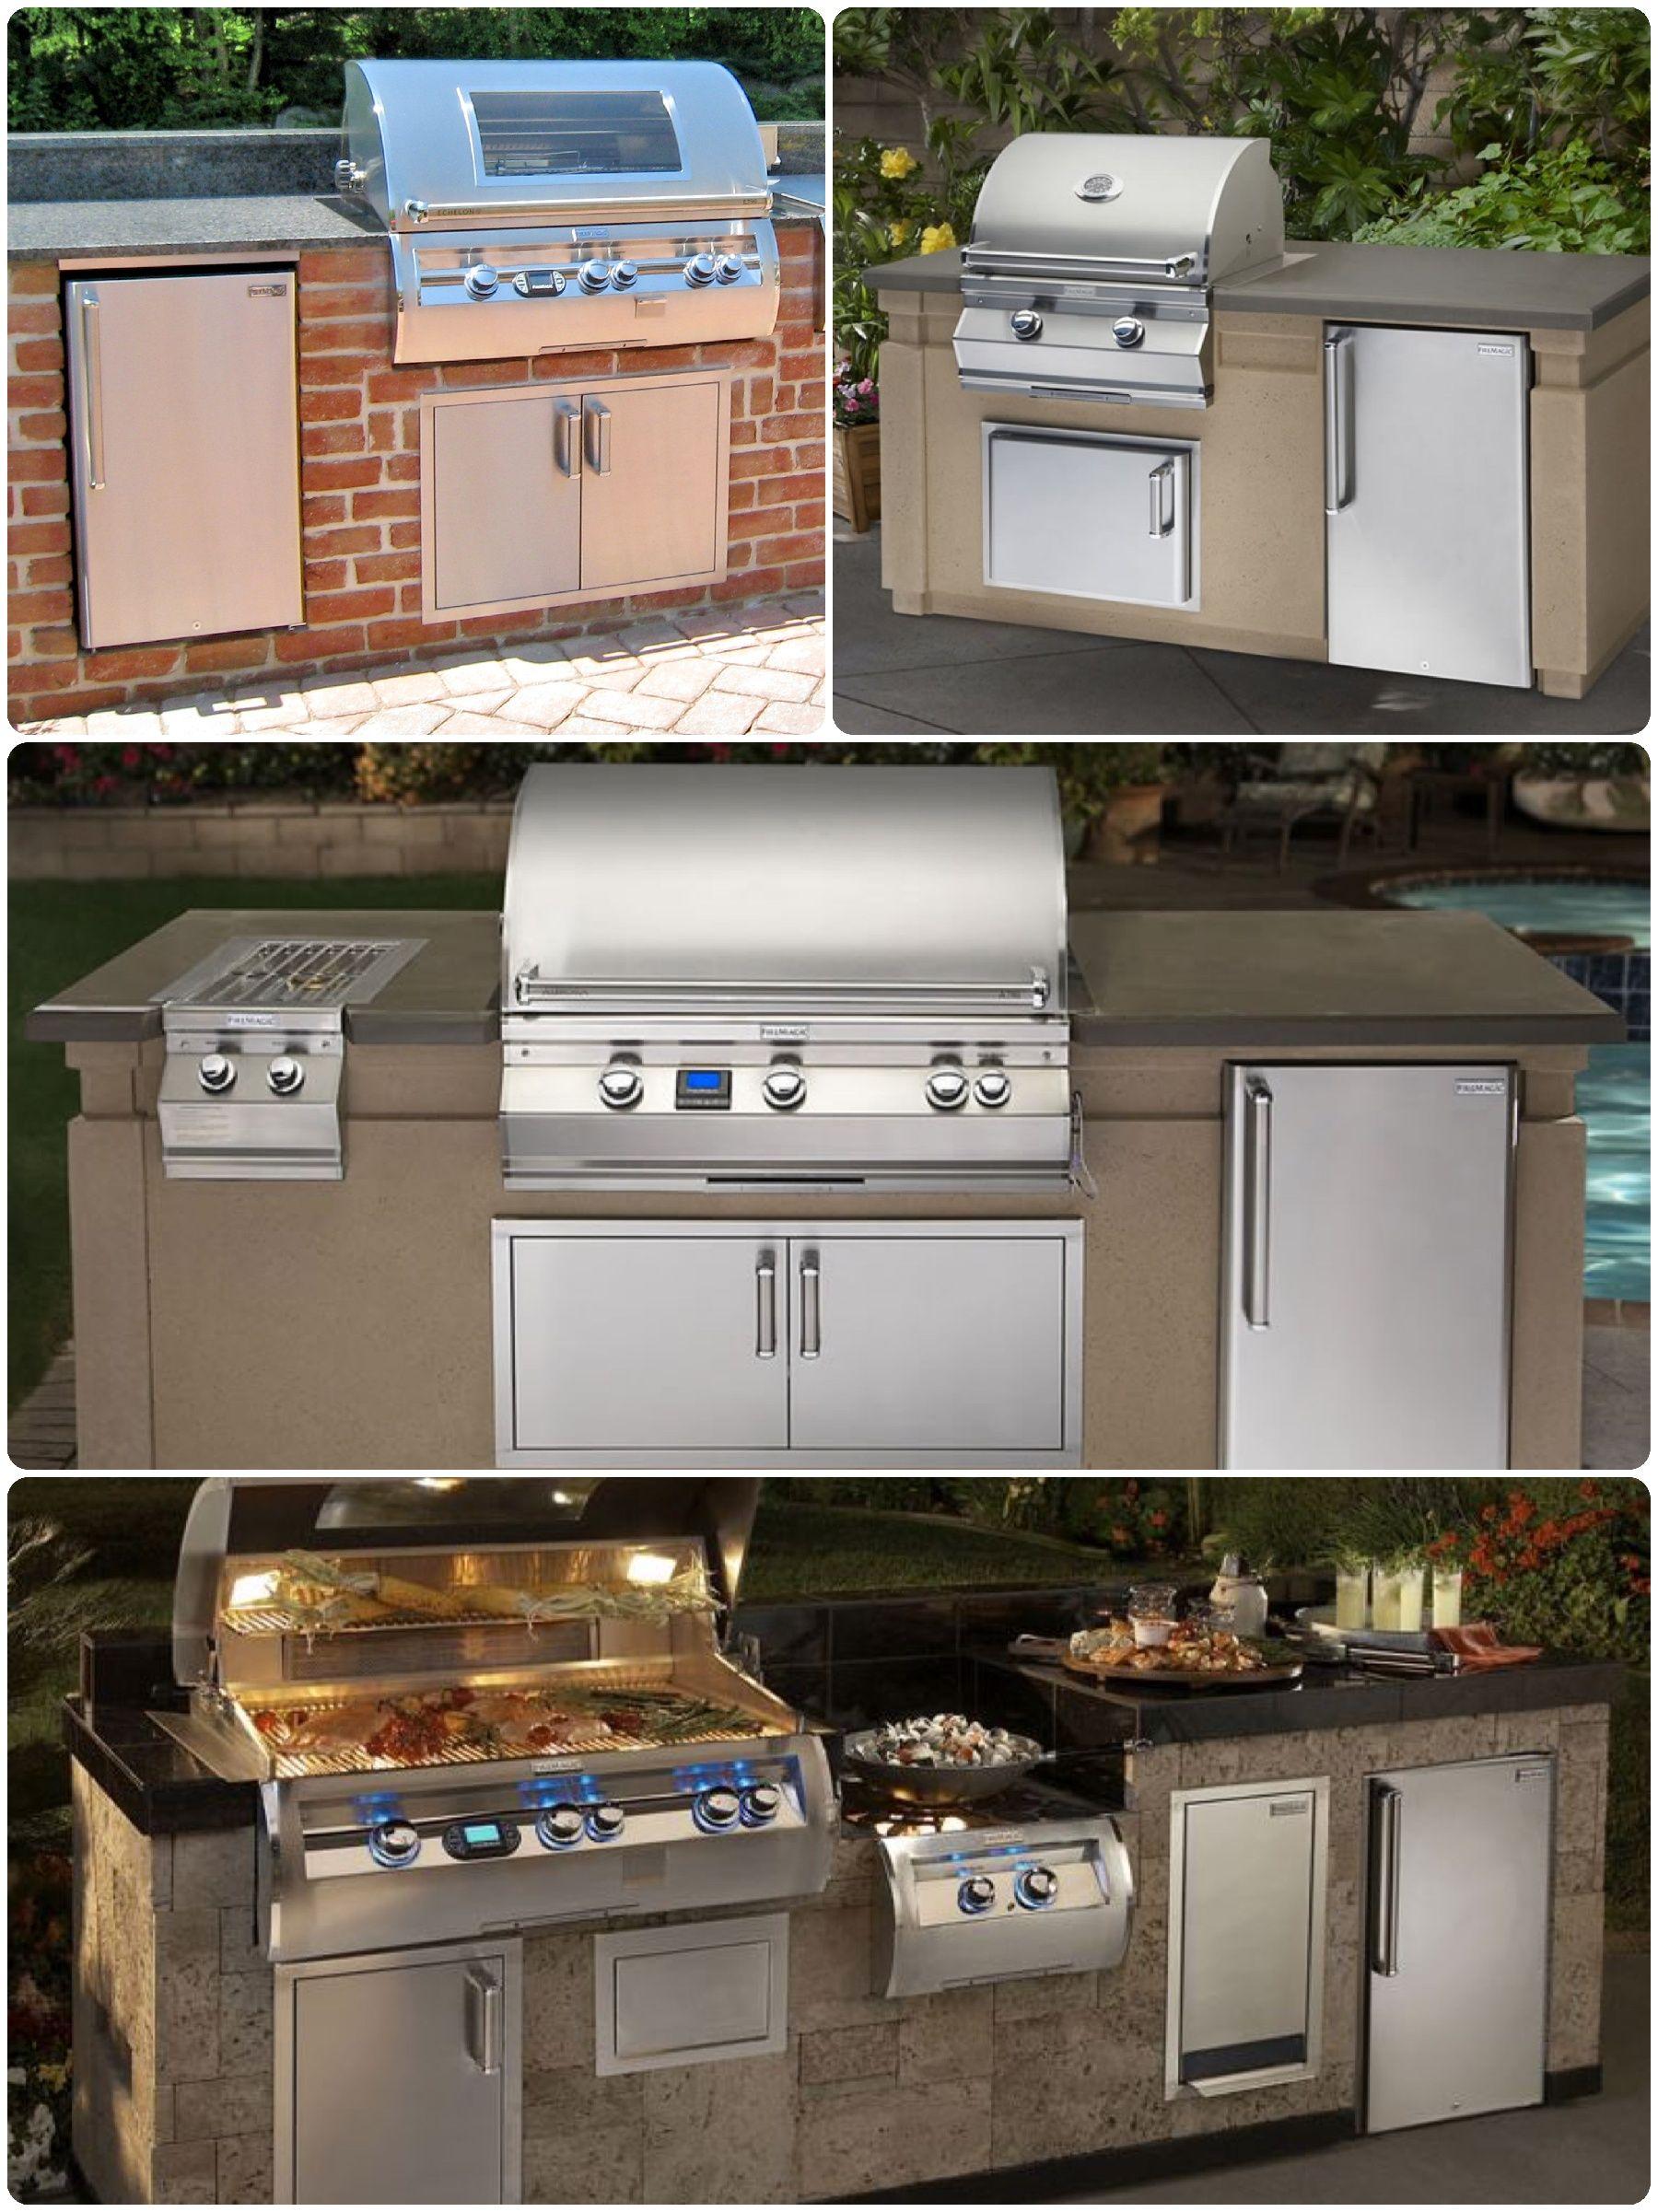 outdoor refrigerator fire magic outdoor kitchen essentials outdoor kitchen outdoor kitchen on outdoor kitchen essentials id=59630